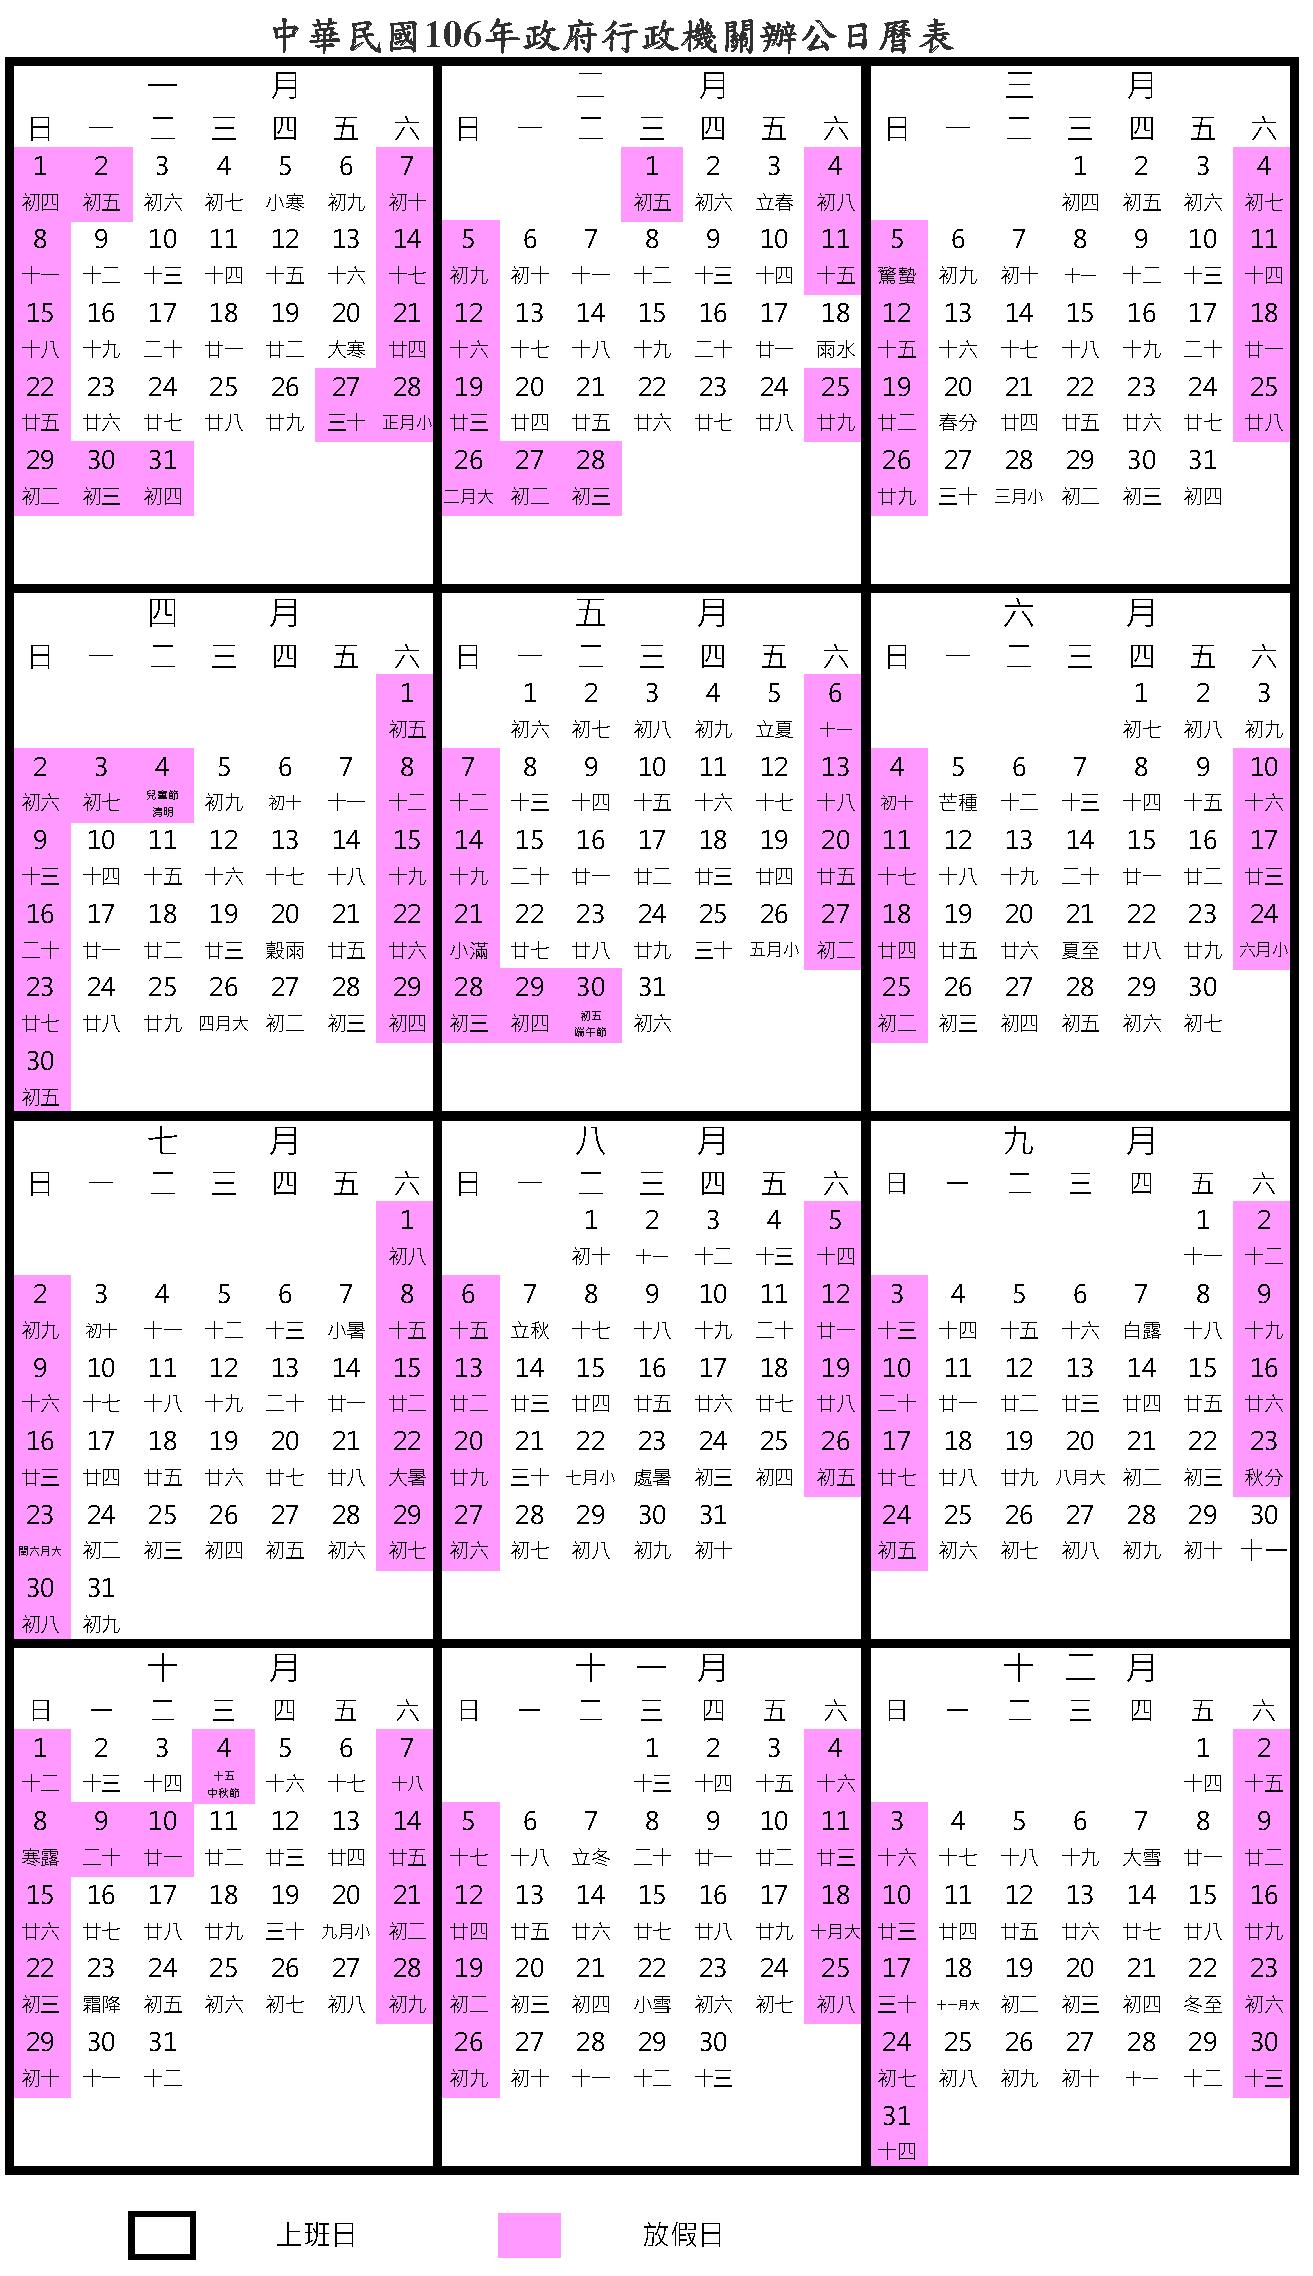 [iOS/Android]一鍵加入2017人事行政休假日曆與開啟臺灣農曆連假 - 瘋先生